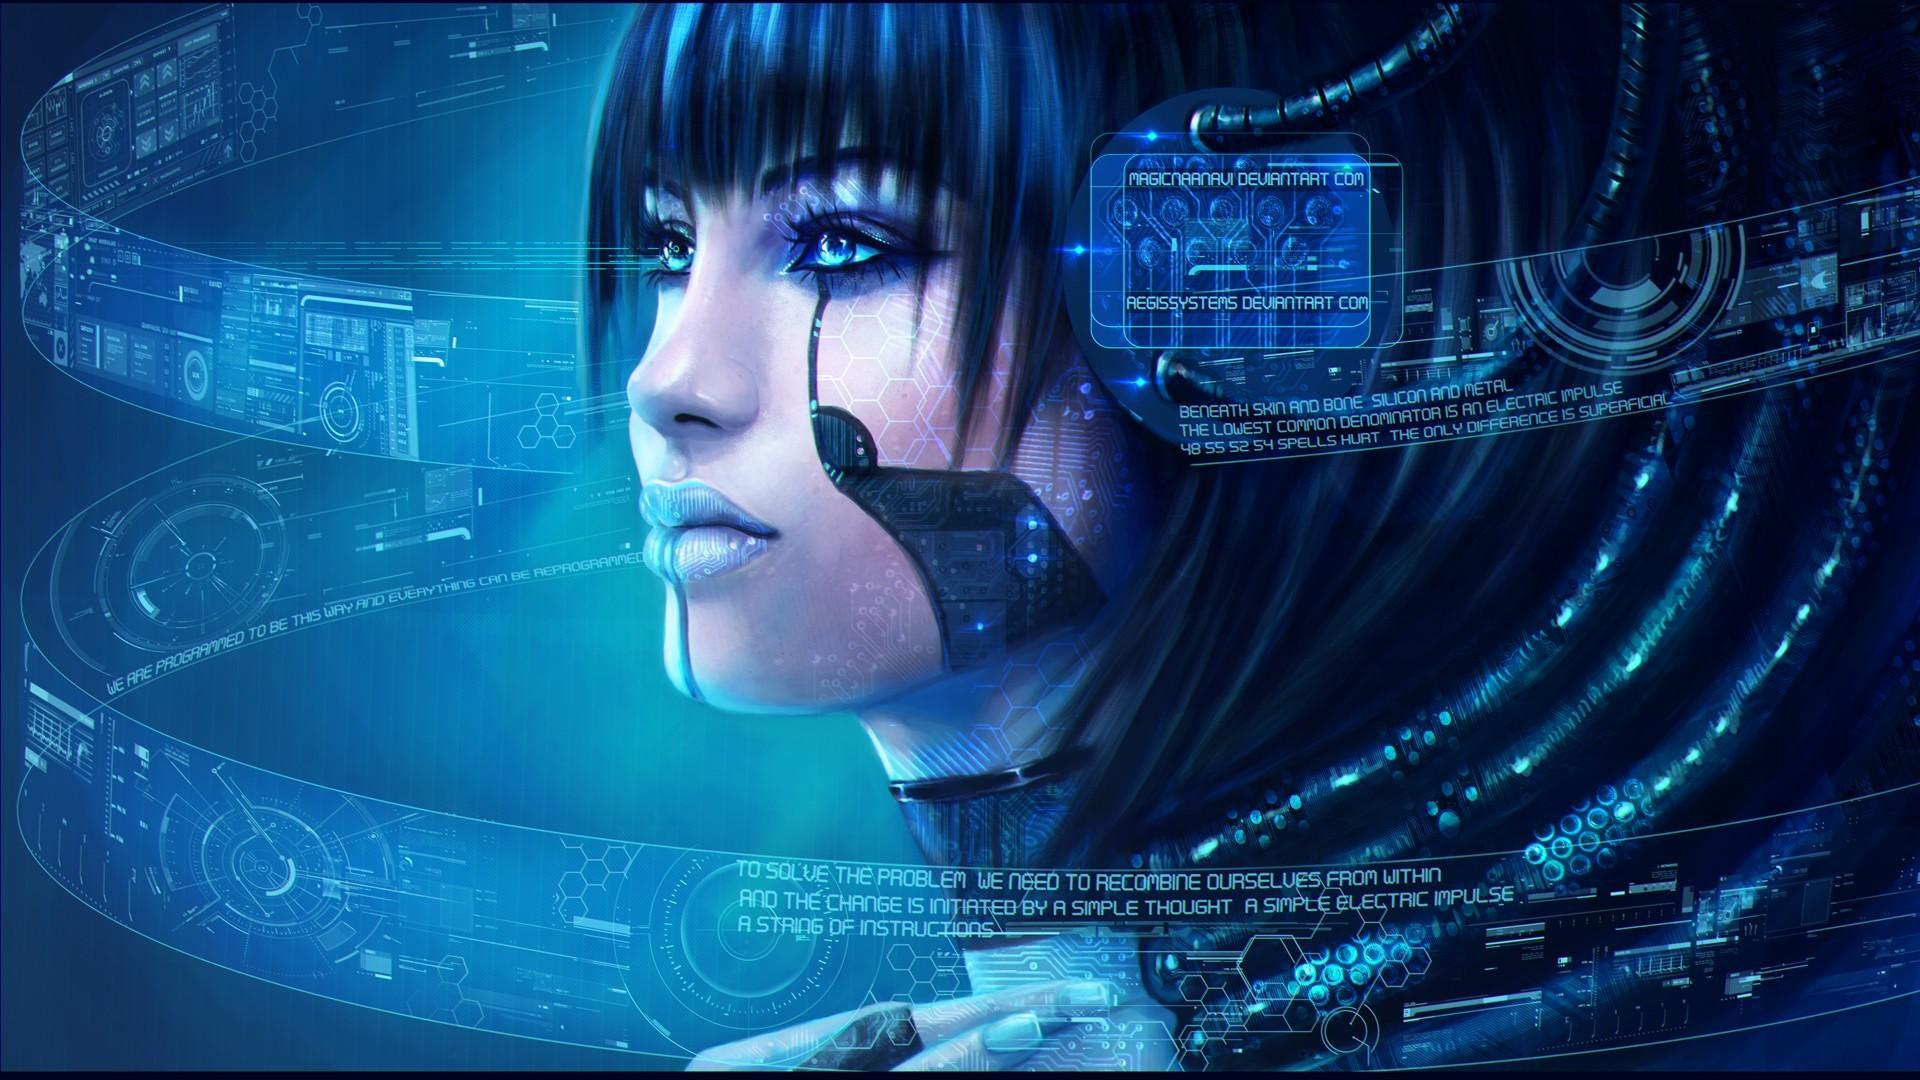 cyberpunk woman digital art hd wallpaper 1920x1080 3199 1920x1080